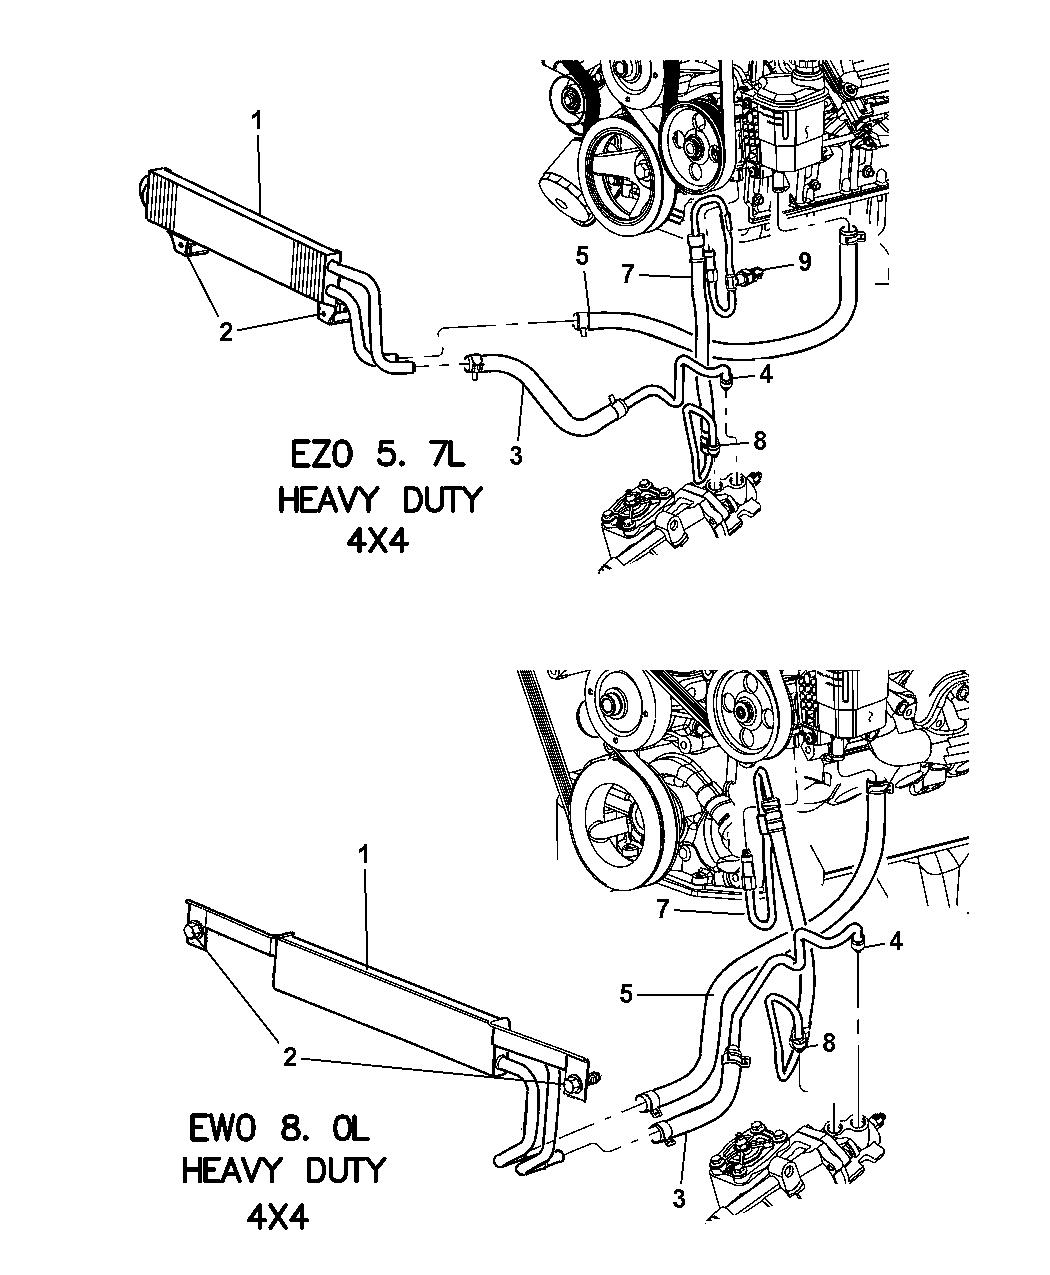 52113639AC - Genuine Mopar LINE-POWER STEERING RETURNMopar Parts Giant